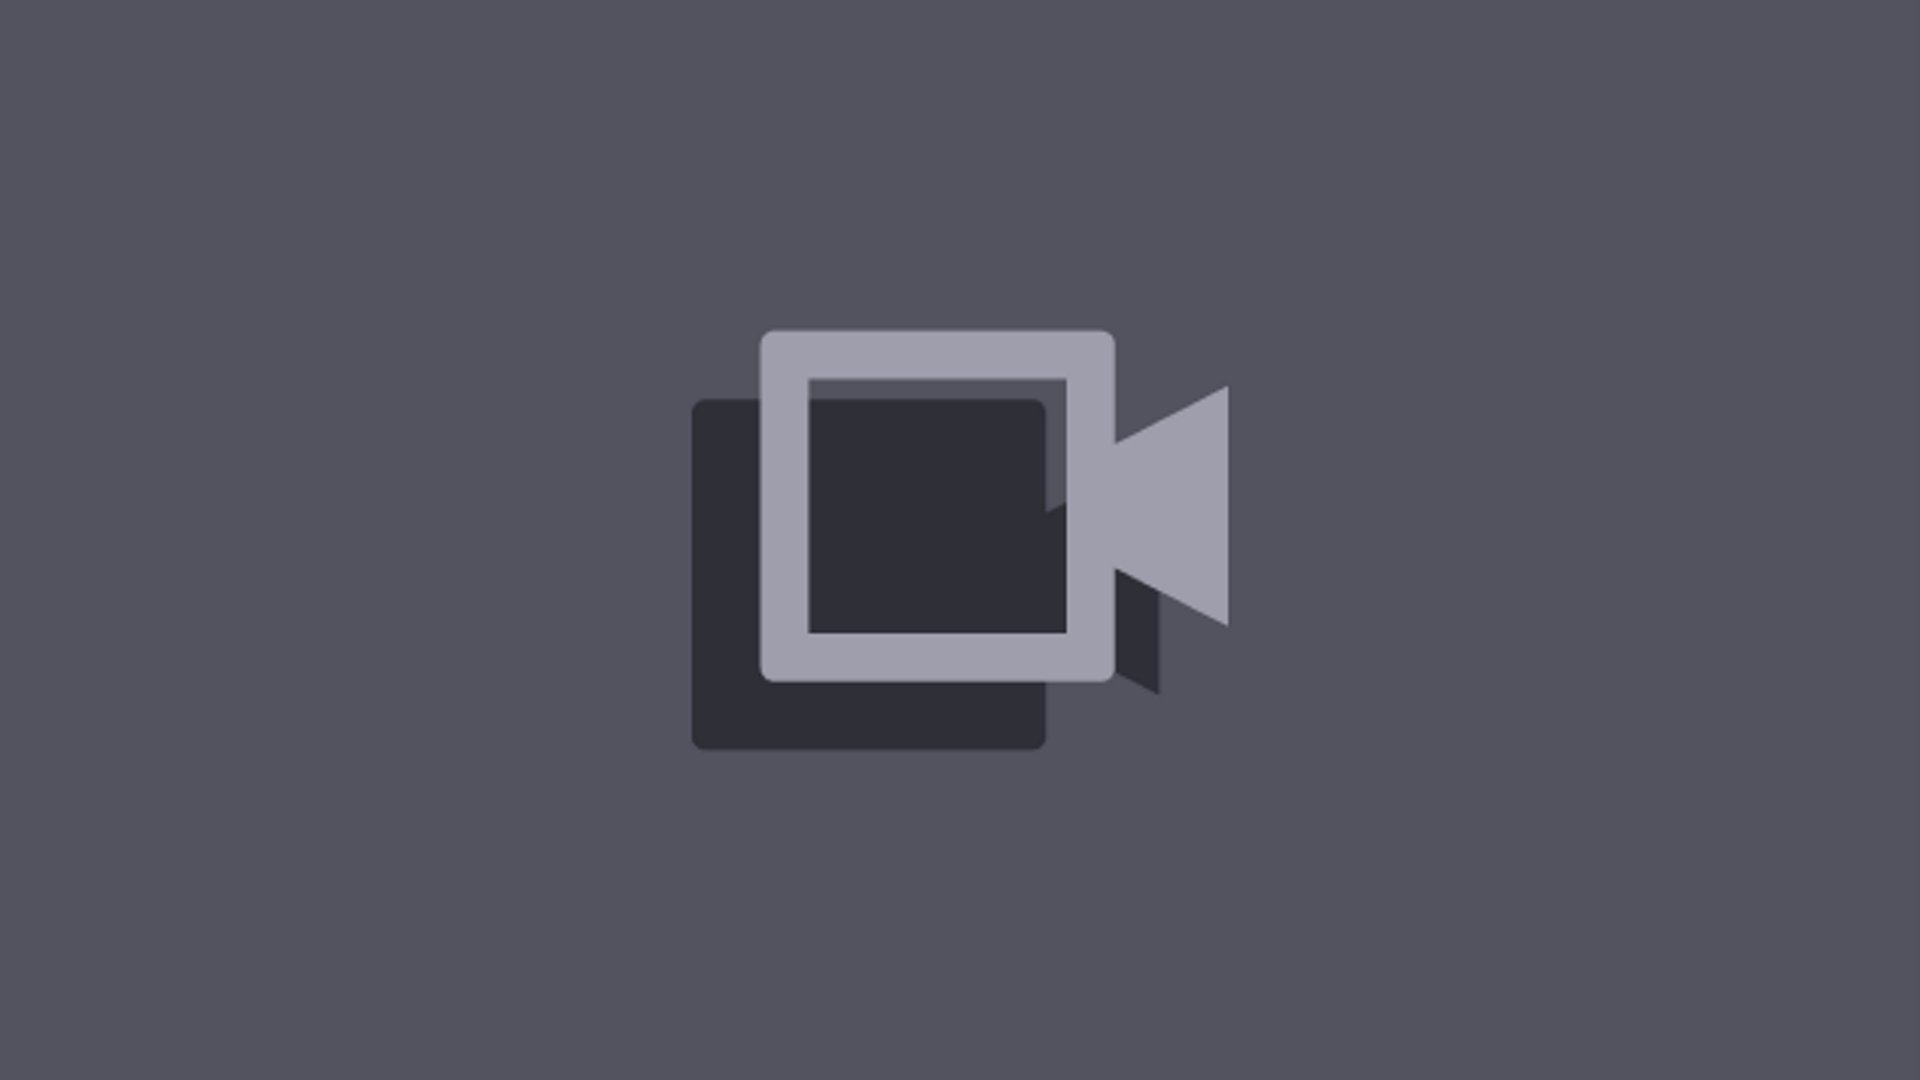 djystorecord video banner